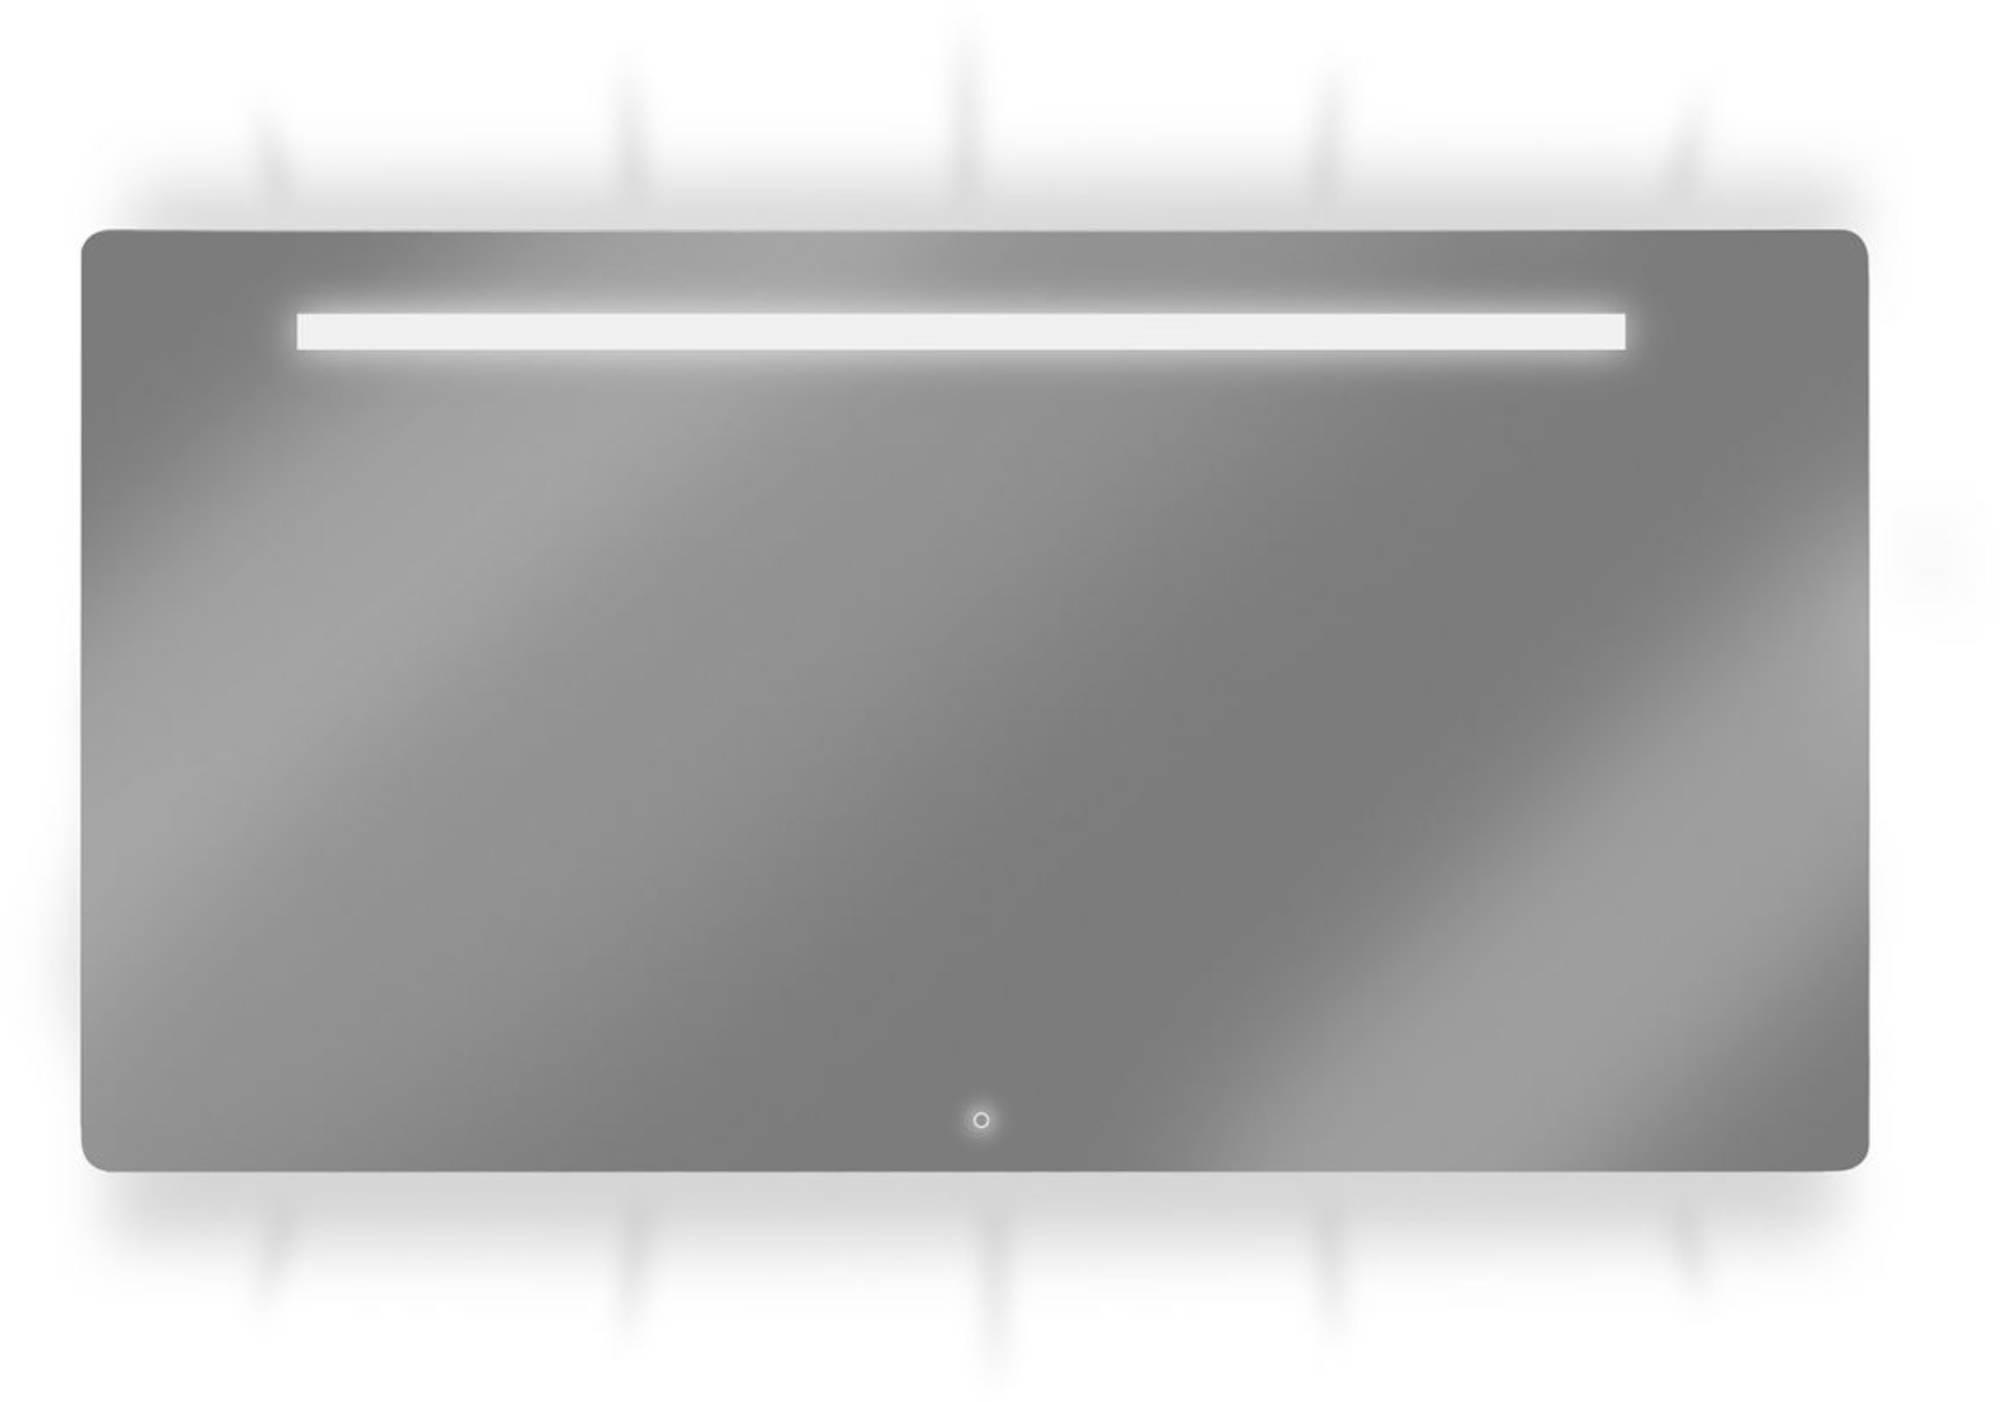 Looox Ml-line spiegel 140x70 led verl.onder+boven+geintegreerd